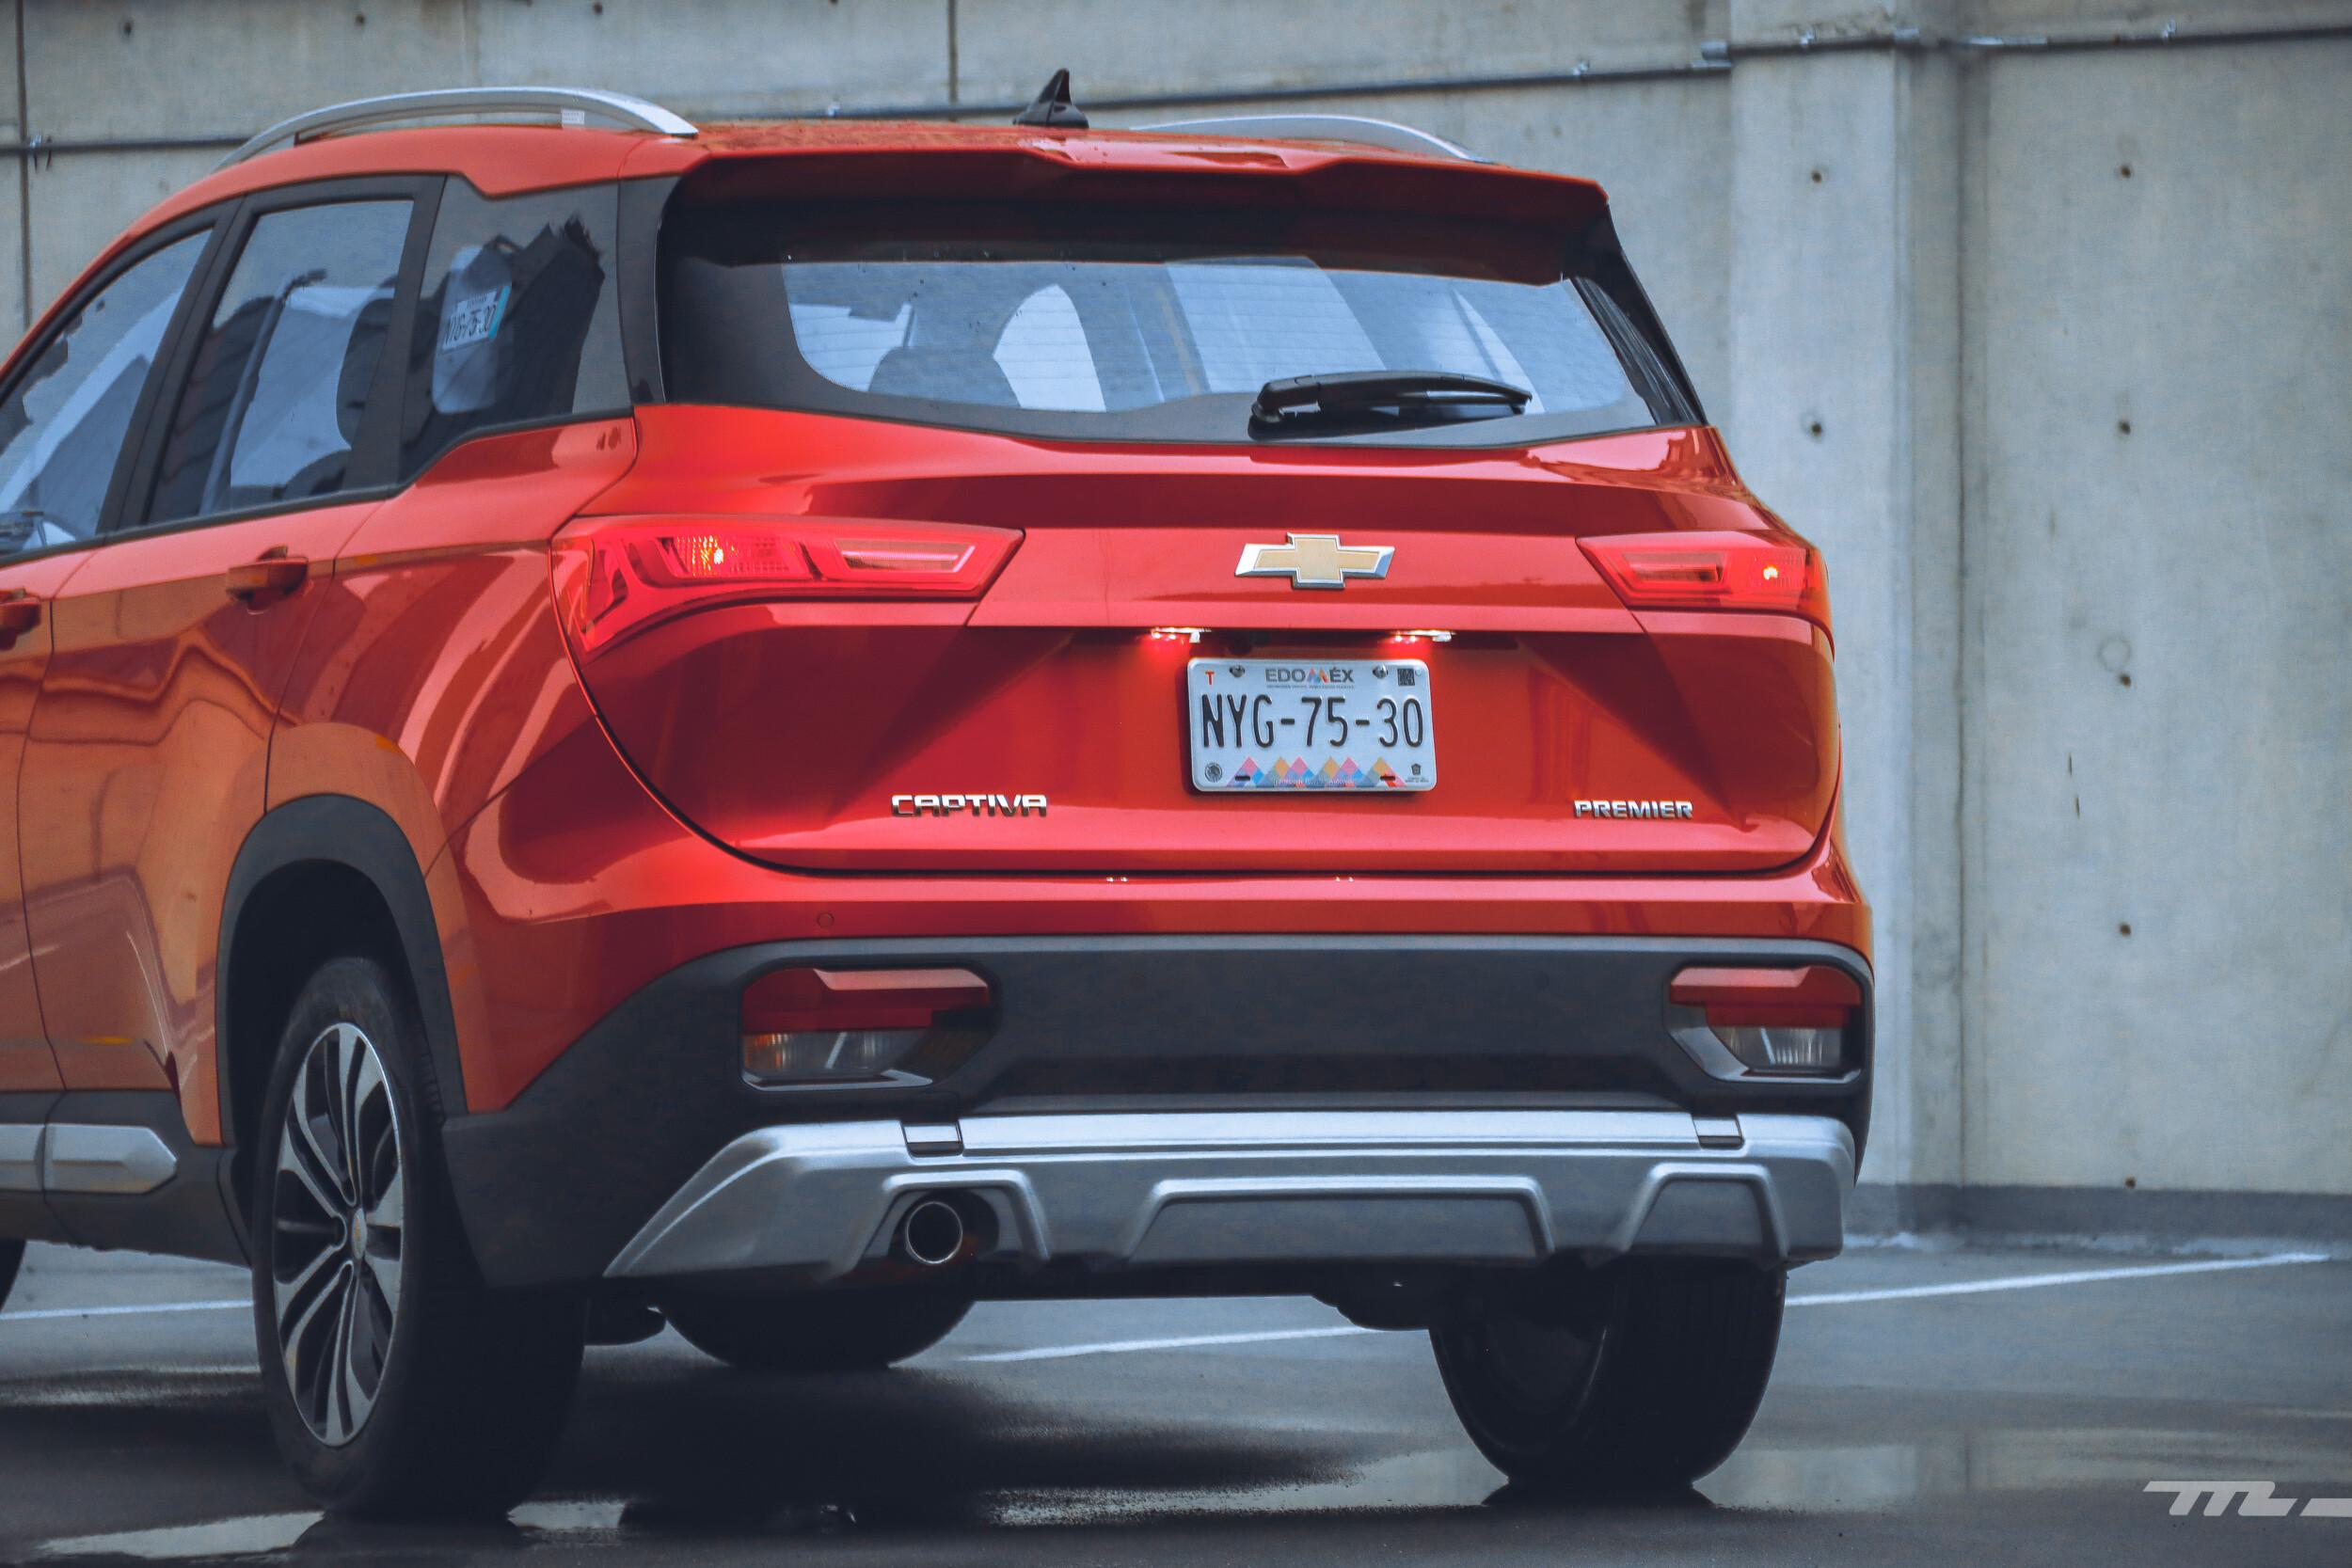 Foto de Chevrolet Captiva 2022 (33/54)